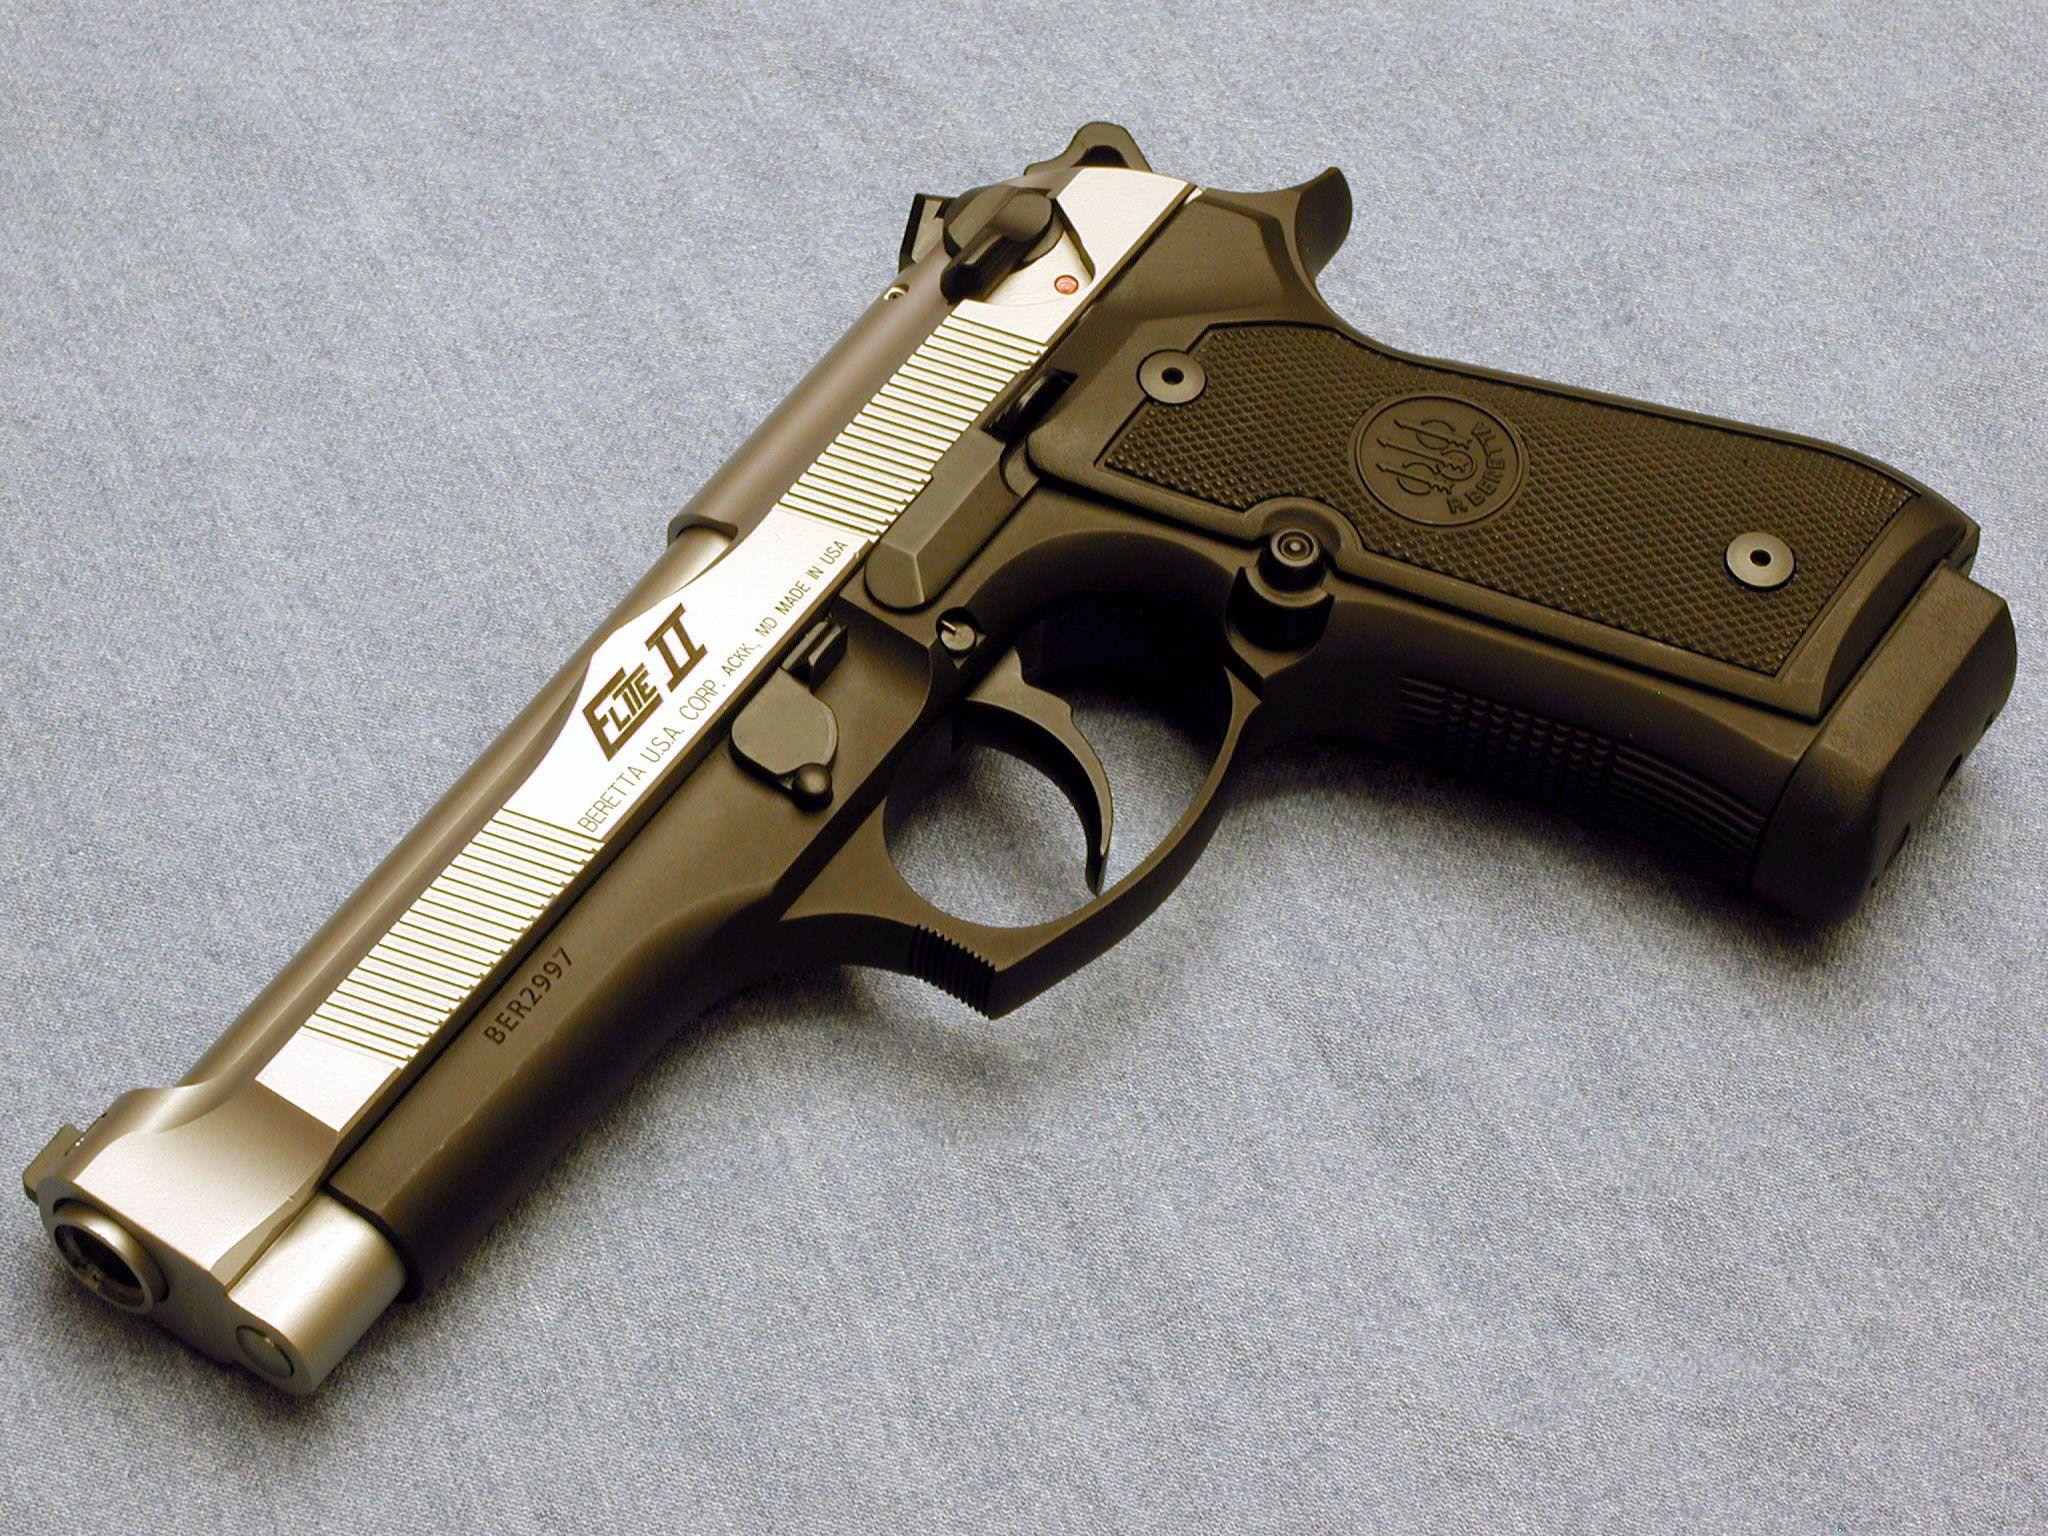 Wallpaper download gun - Free Download Automatic Guns Or Pistol Desktop Wallpapers Free